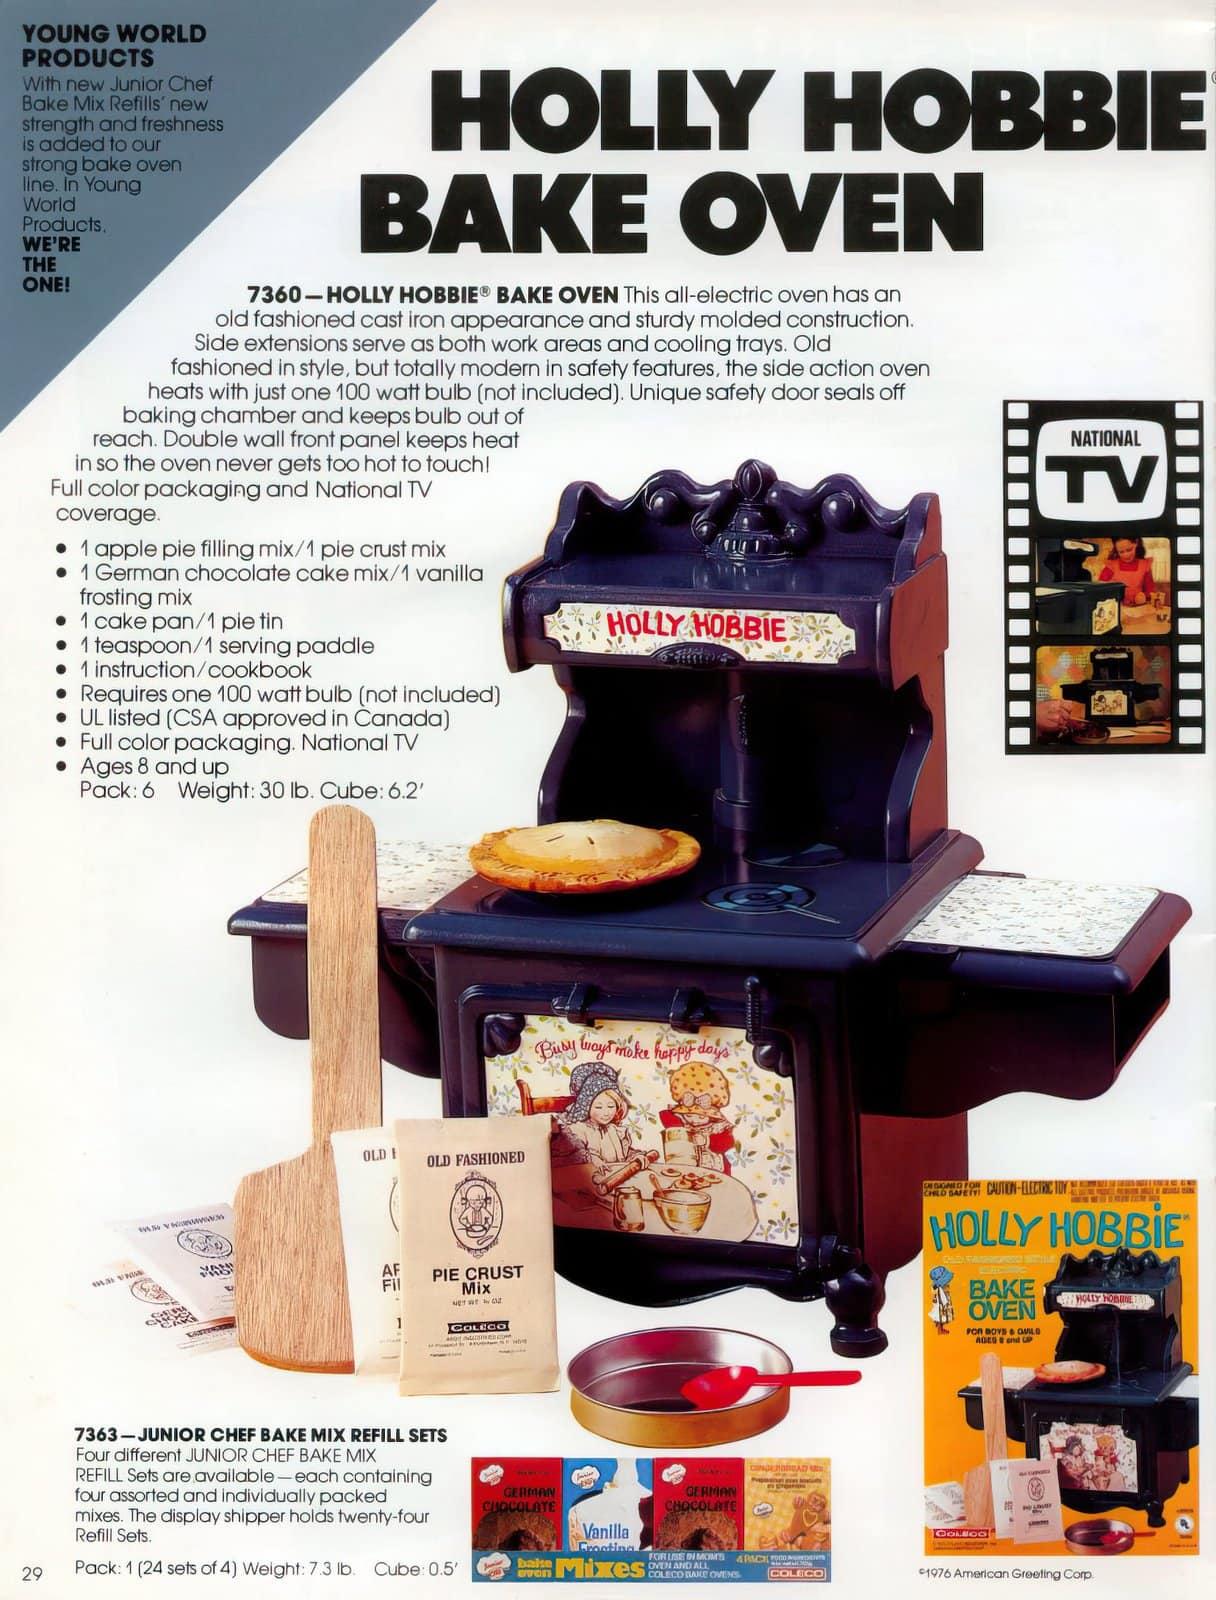 1980 Coleco Hollie Hobbie Bake Oven